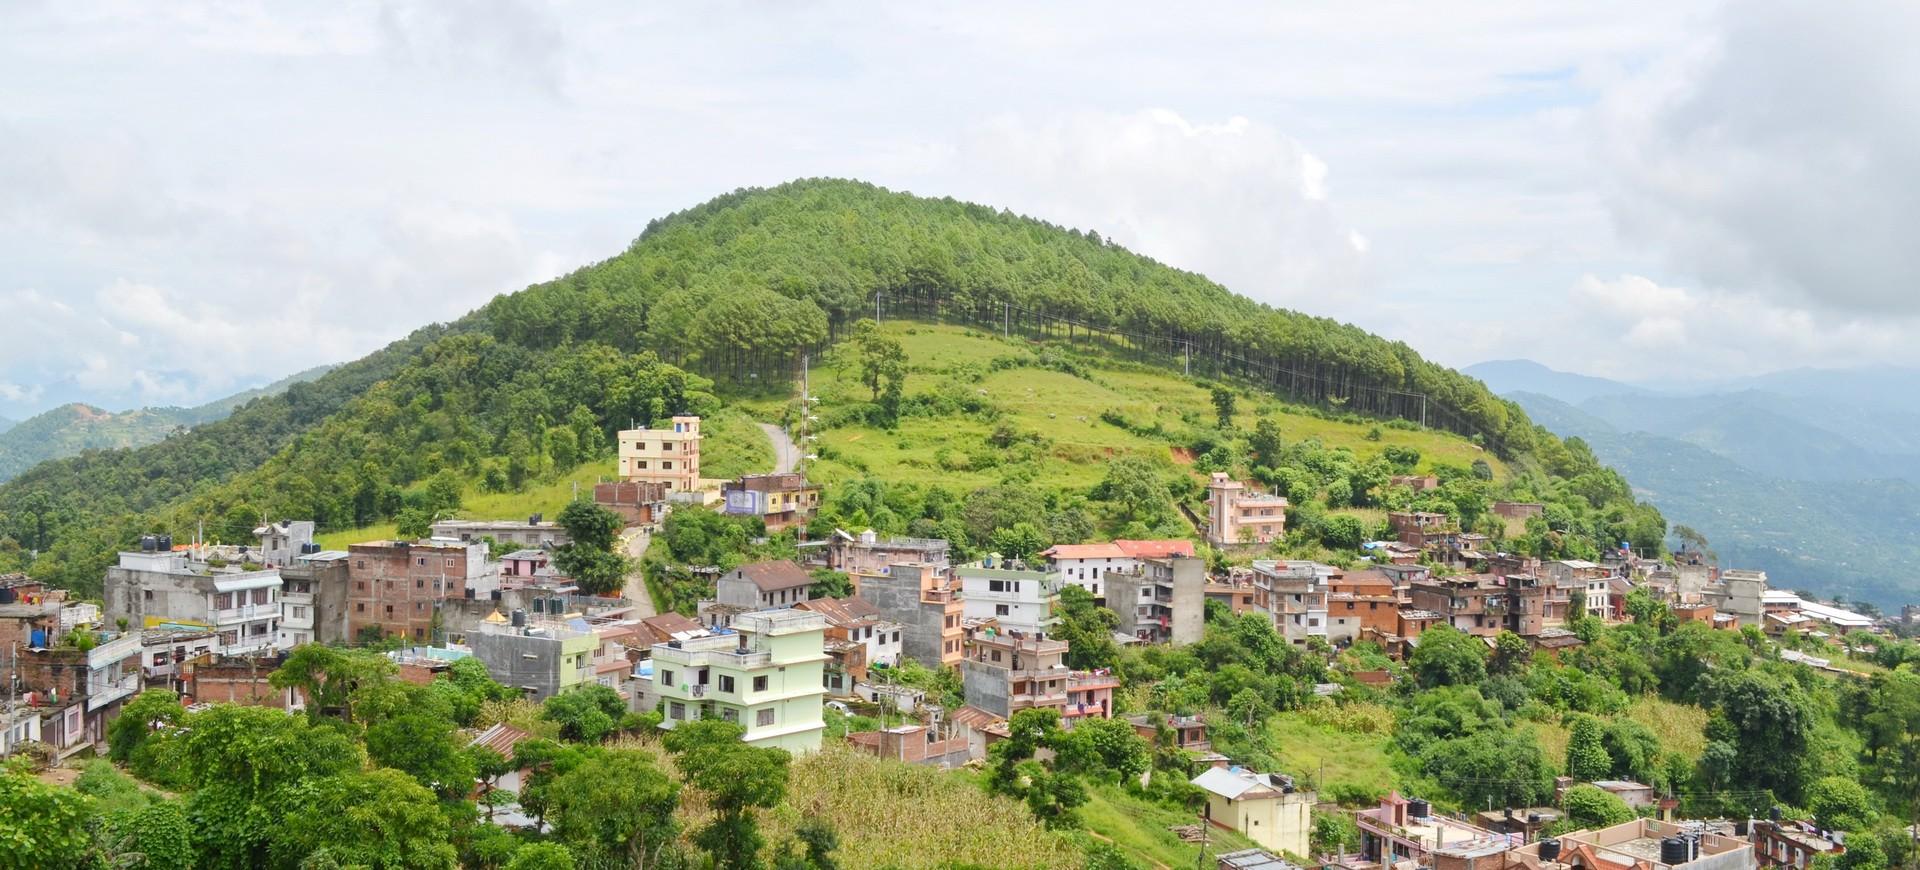 Népal Tansen Village